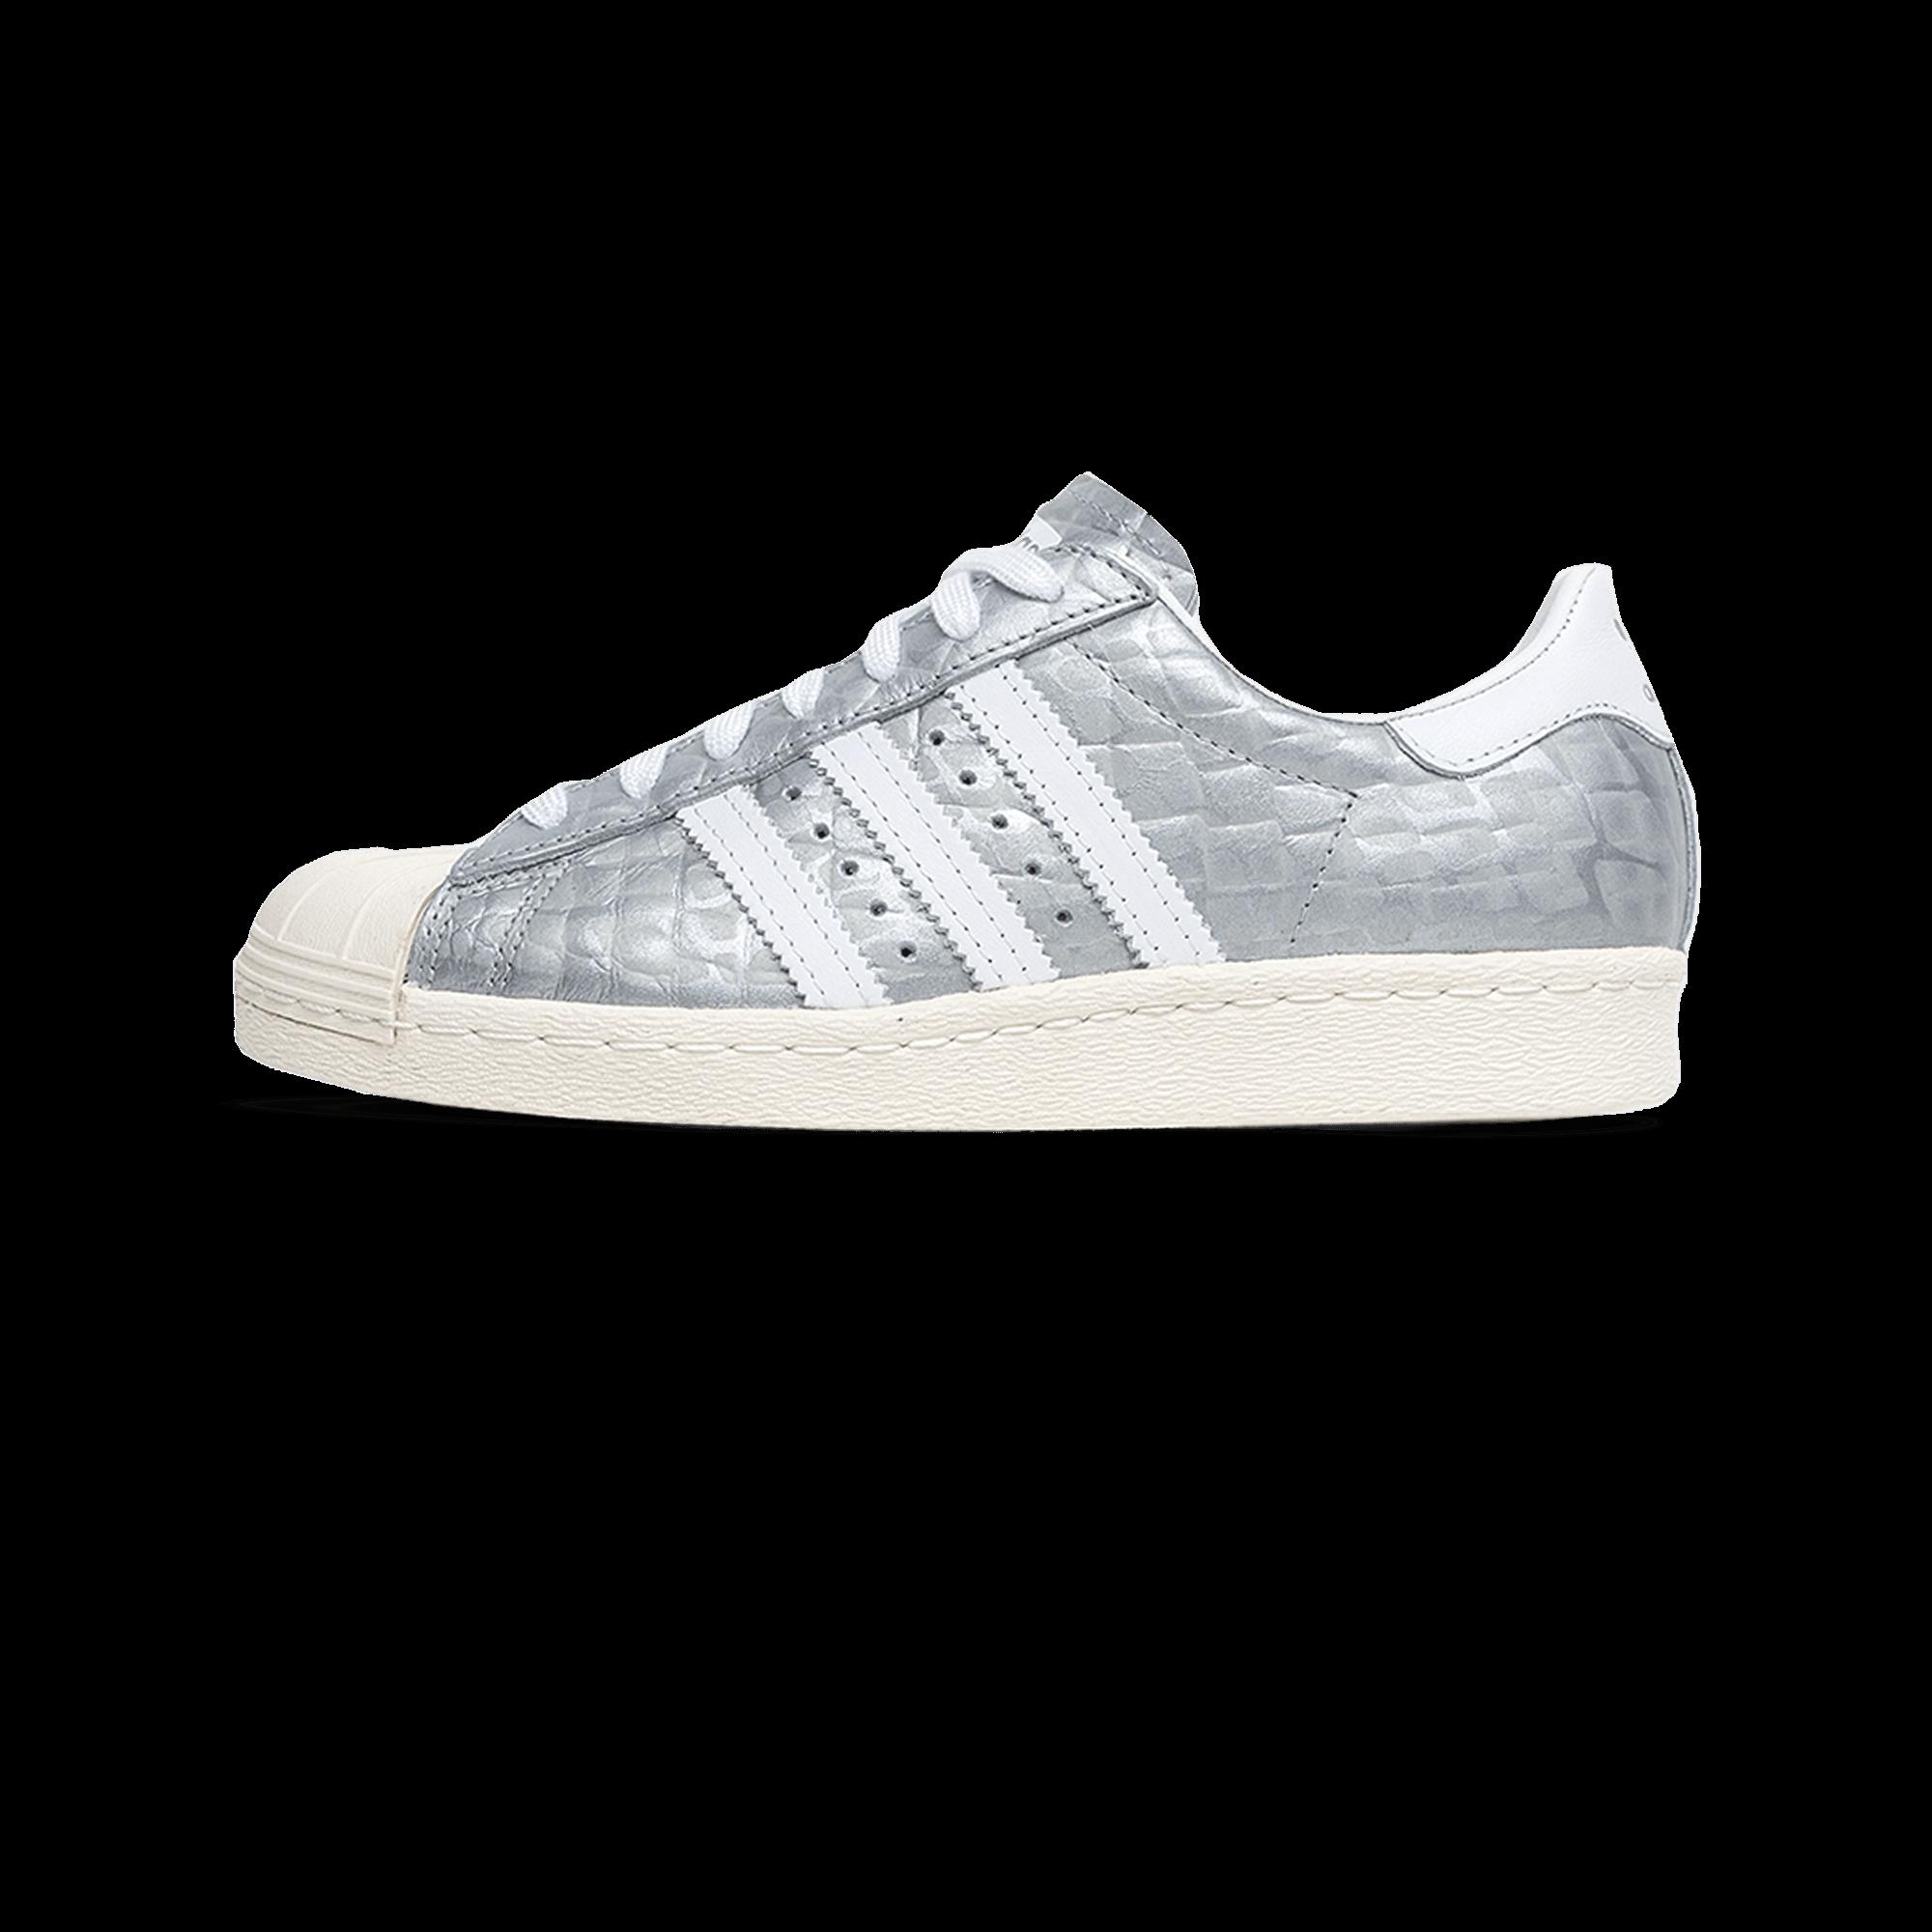 Adidas Crock Woman Silver 80s Superstar c5ASj4Lq3R